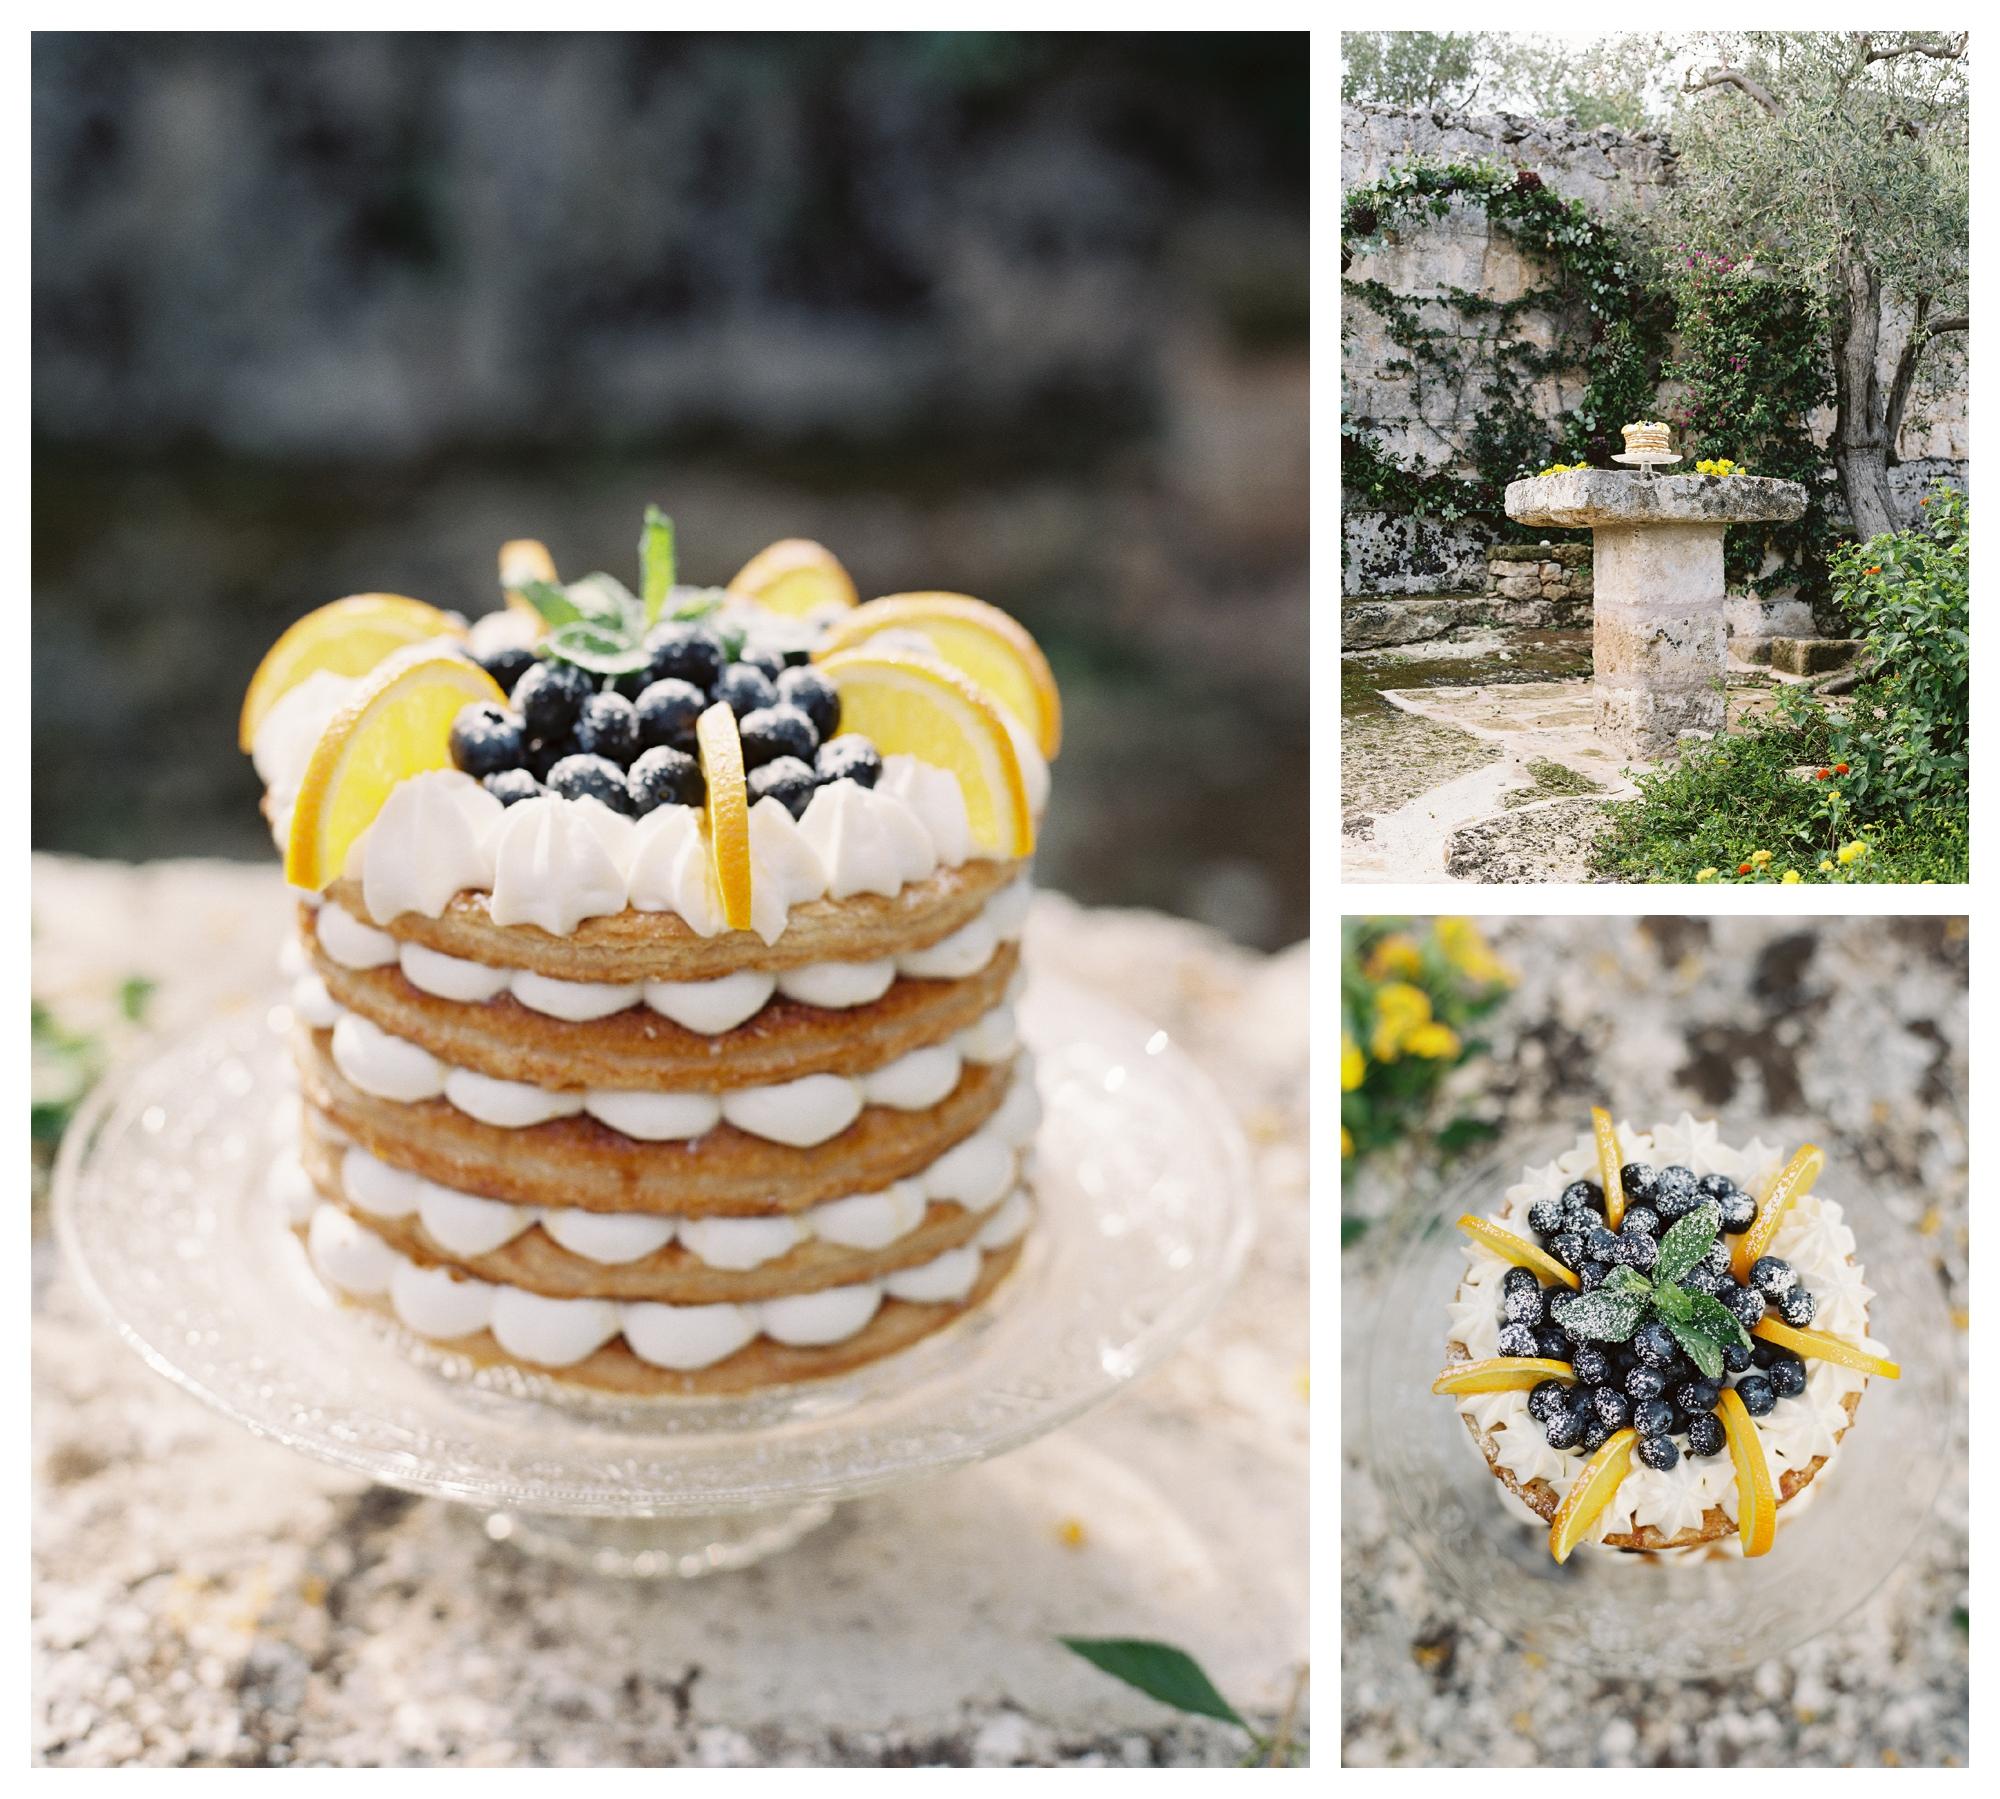 millefoglie cake, wedding cake, italian wedding cake, summer wedding